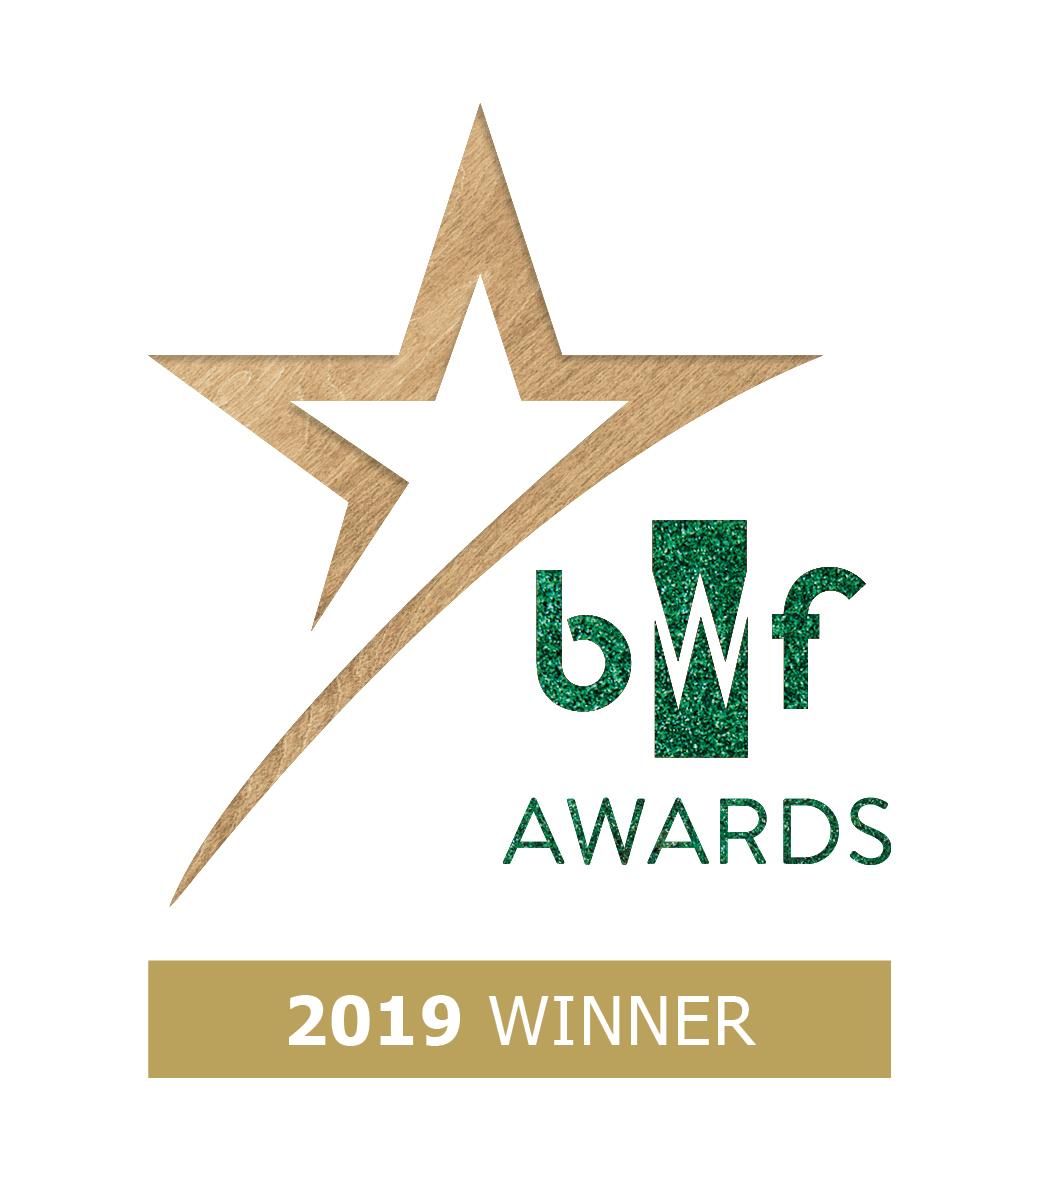 BWF Awards 2019 - Winners Announced